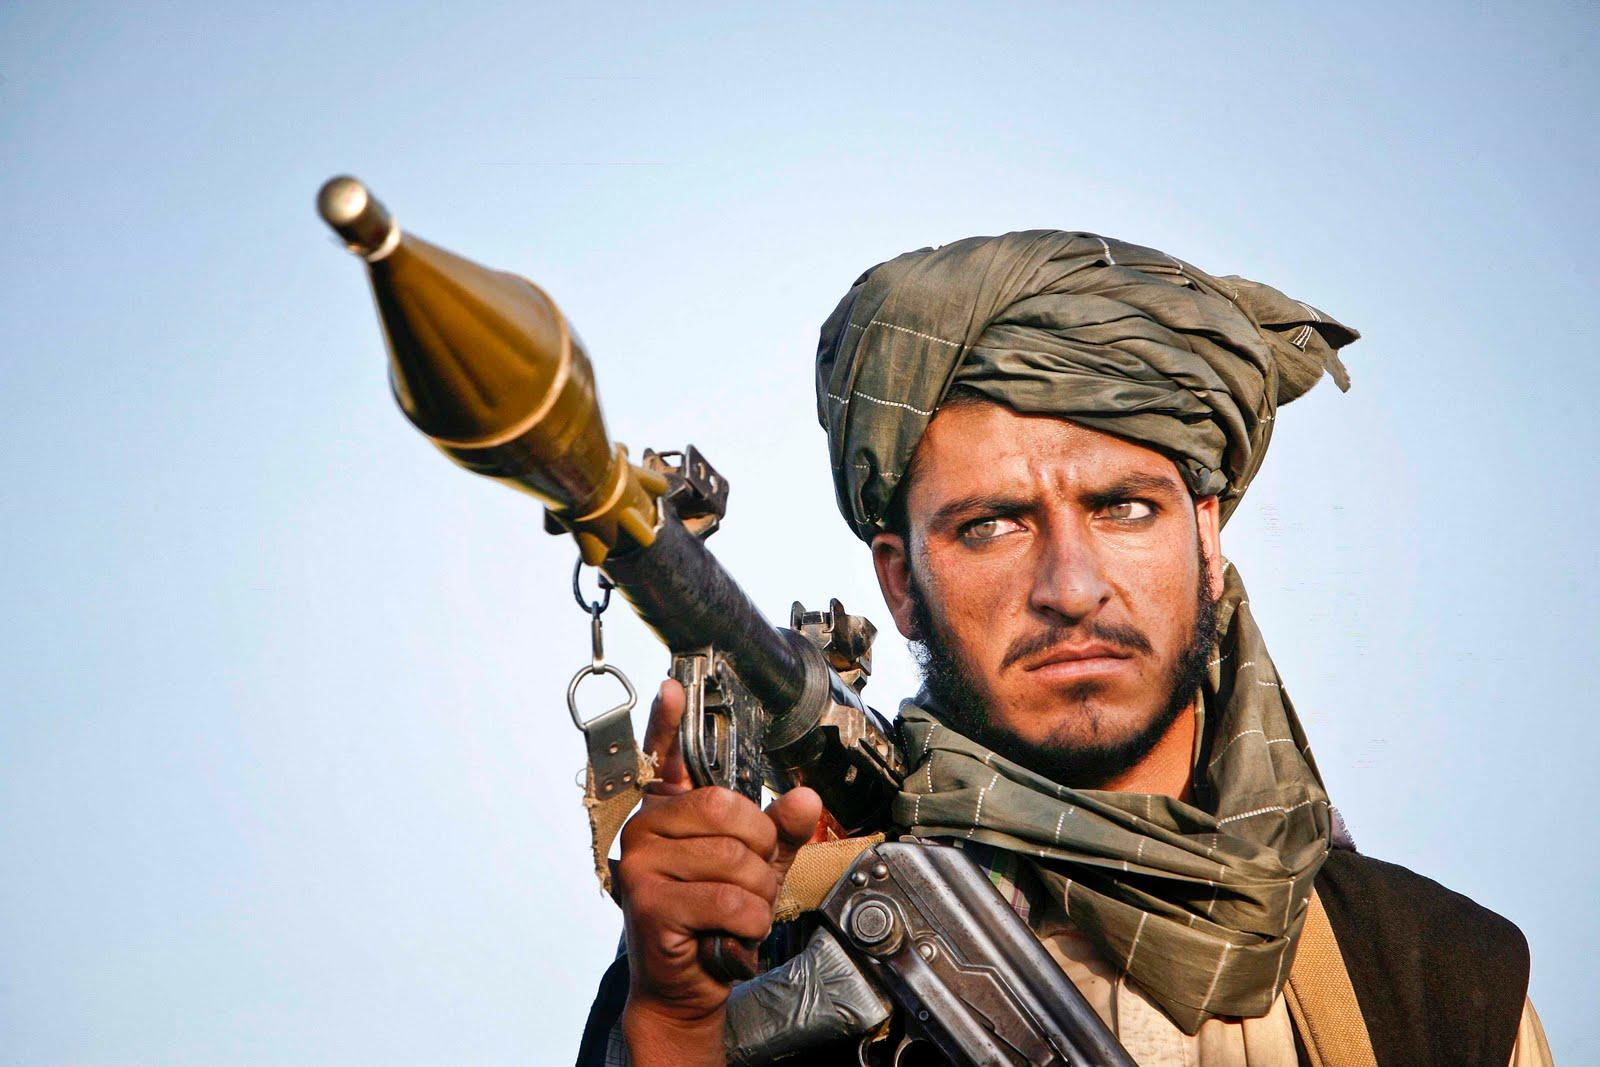 http://syariftambakoso.files.wordpress.com/2010/11/taliban-rpg.jpg